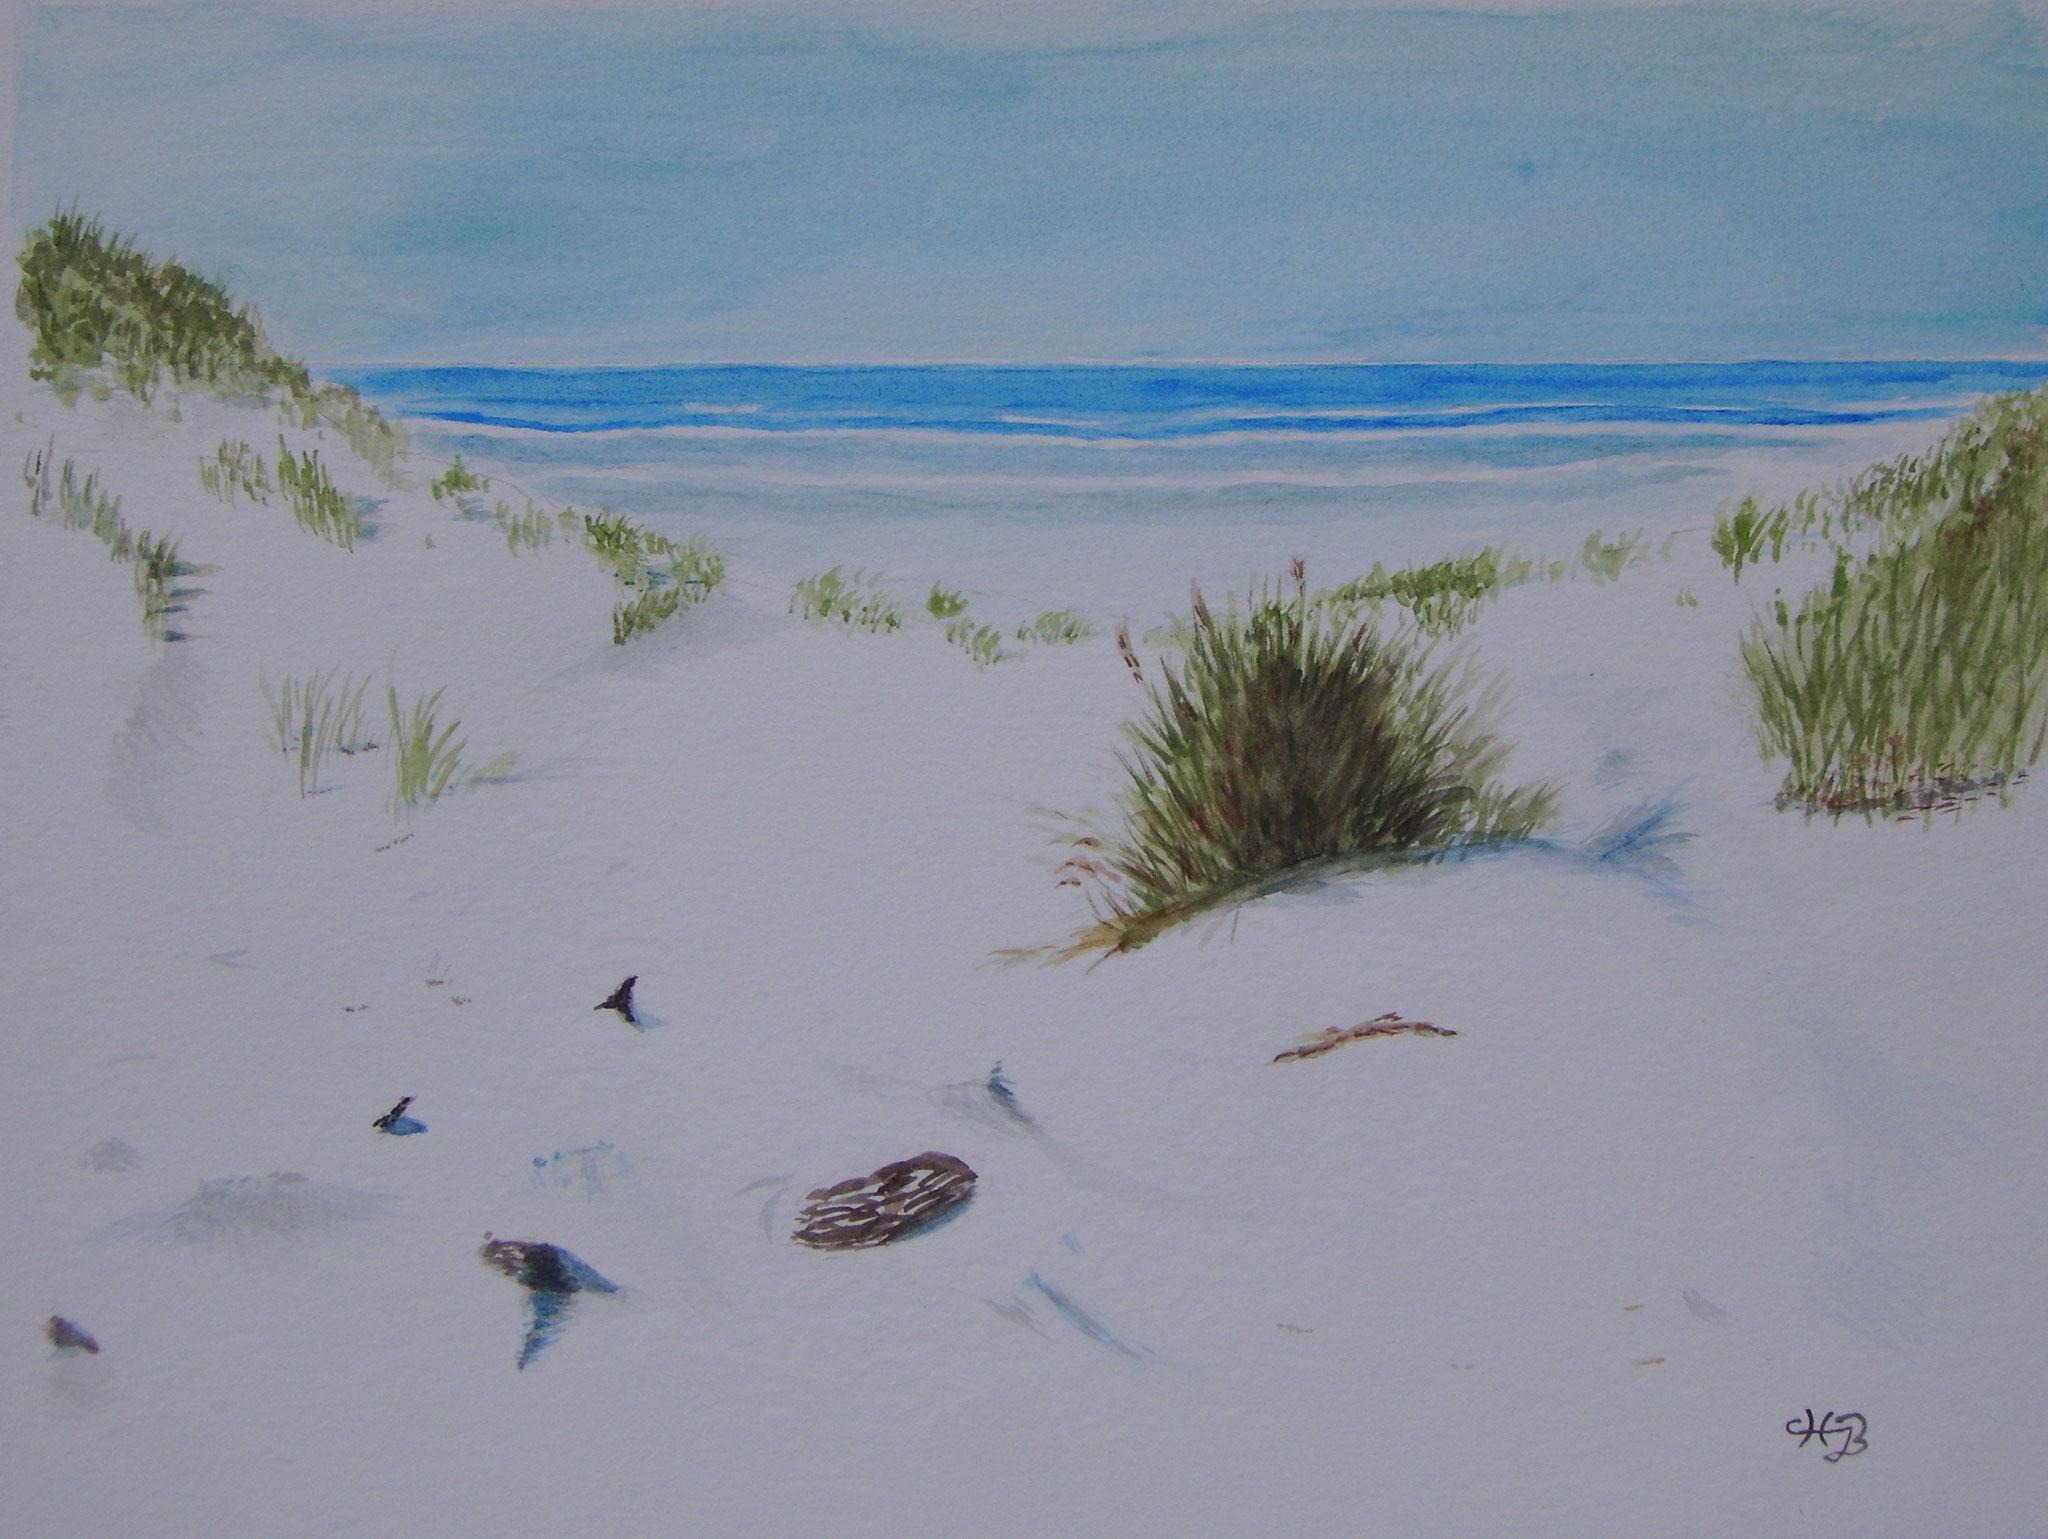 Strandszene 2, 2006, Aquarell, 32 x 23,5 cm